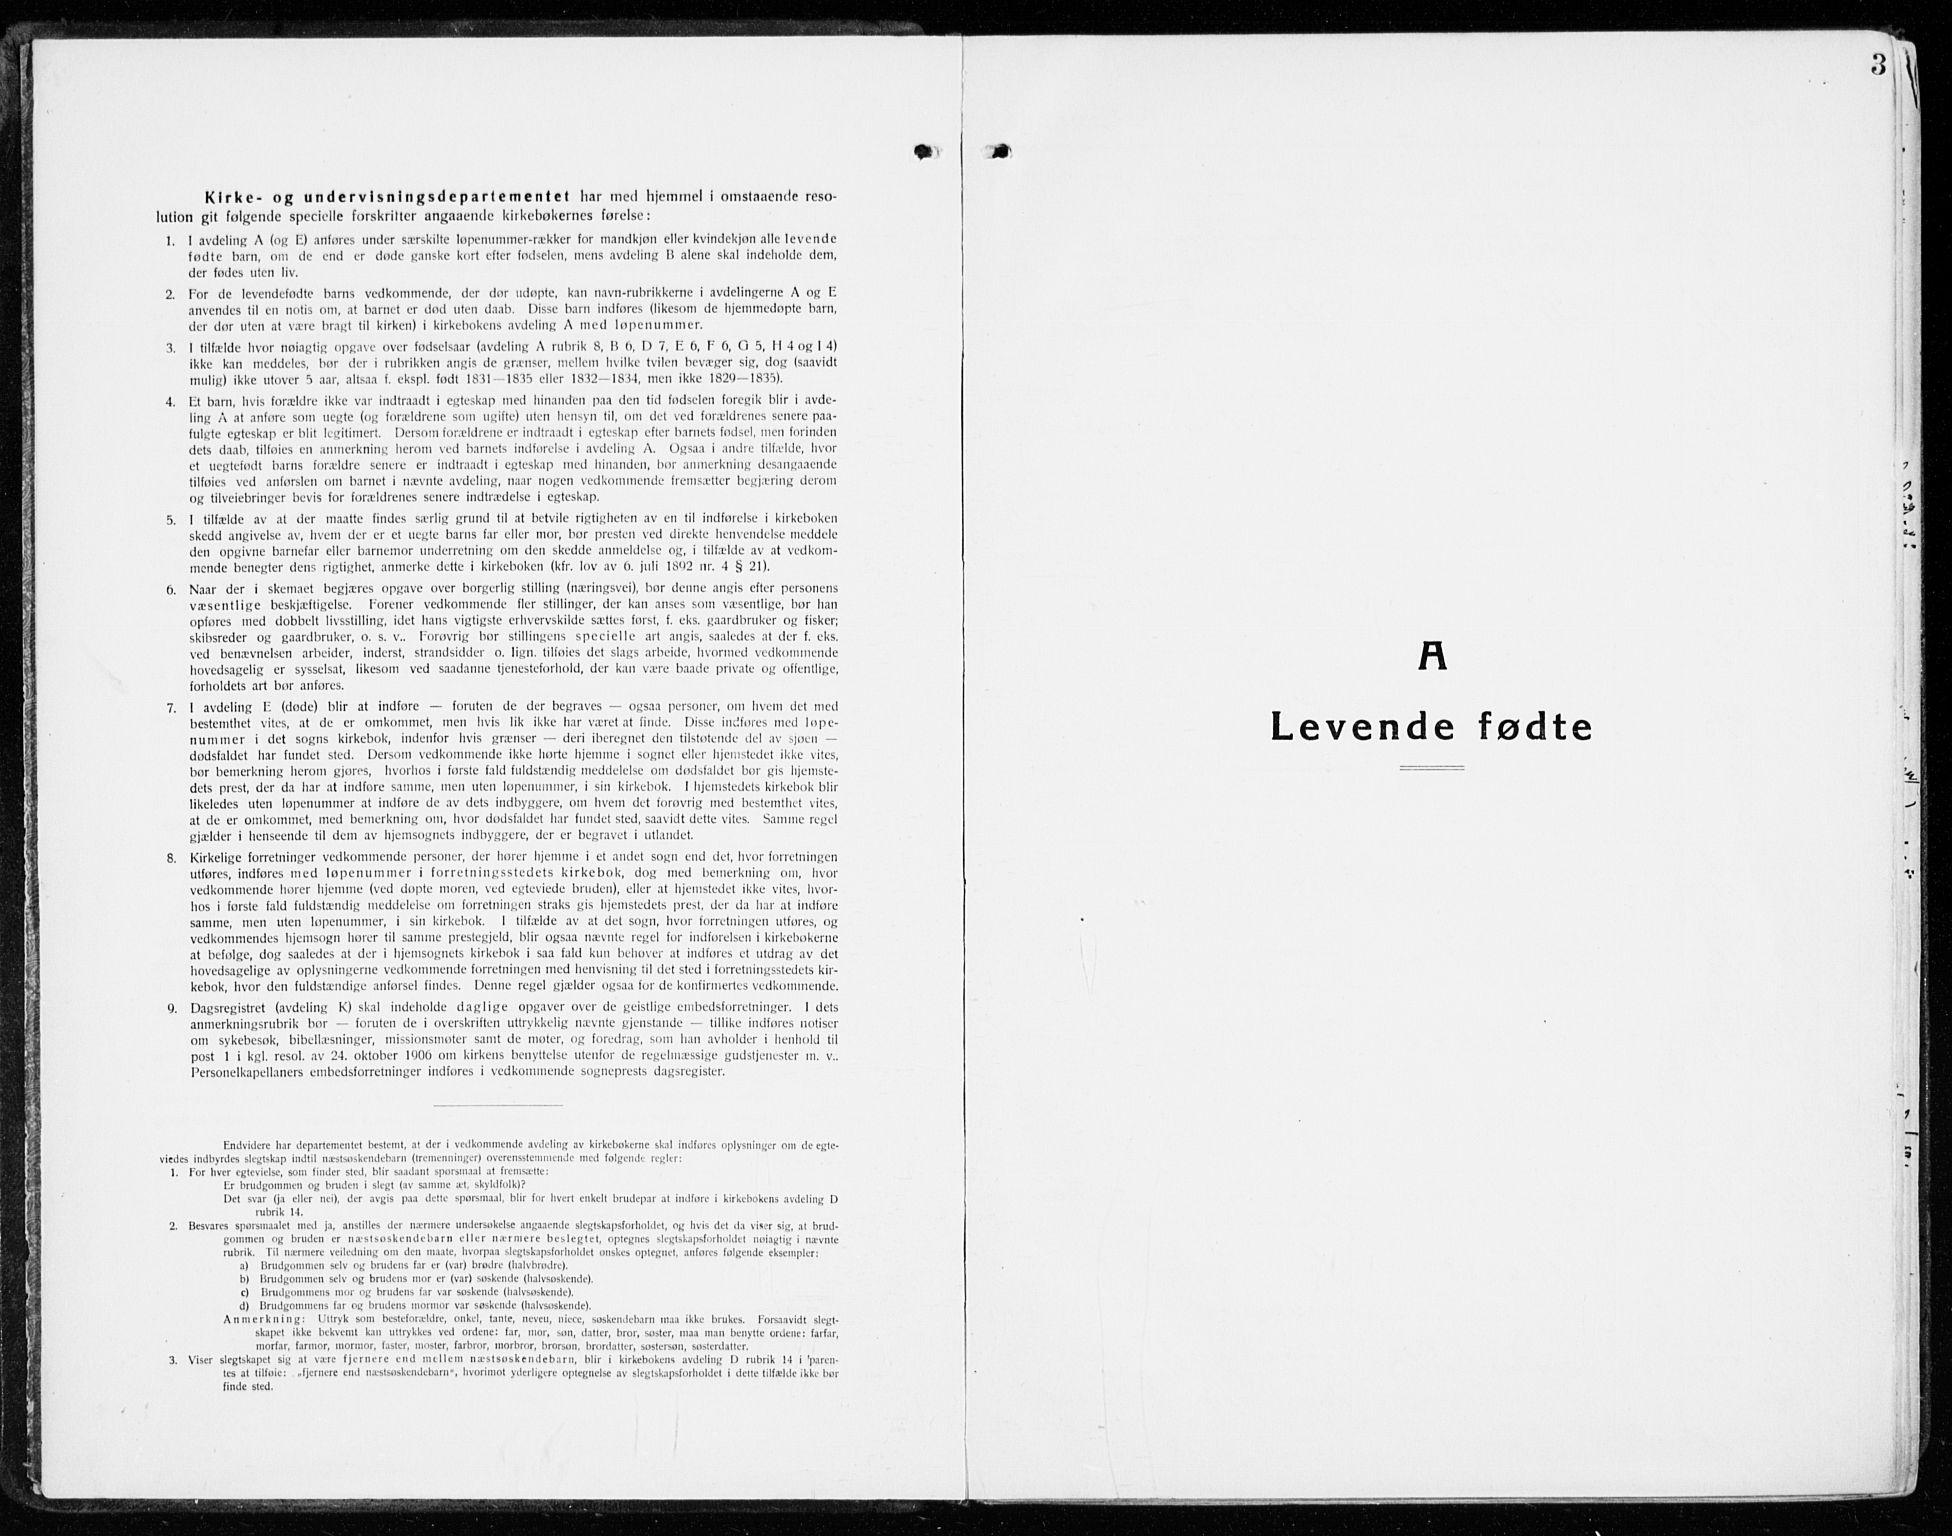 SAH, Stange prestekontor, K/L0025: Ministerialbok nr. 25, 1921-1945, s. 3